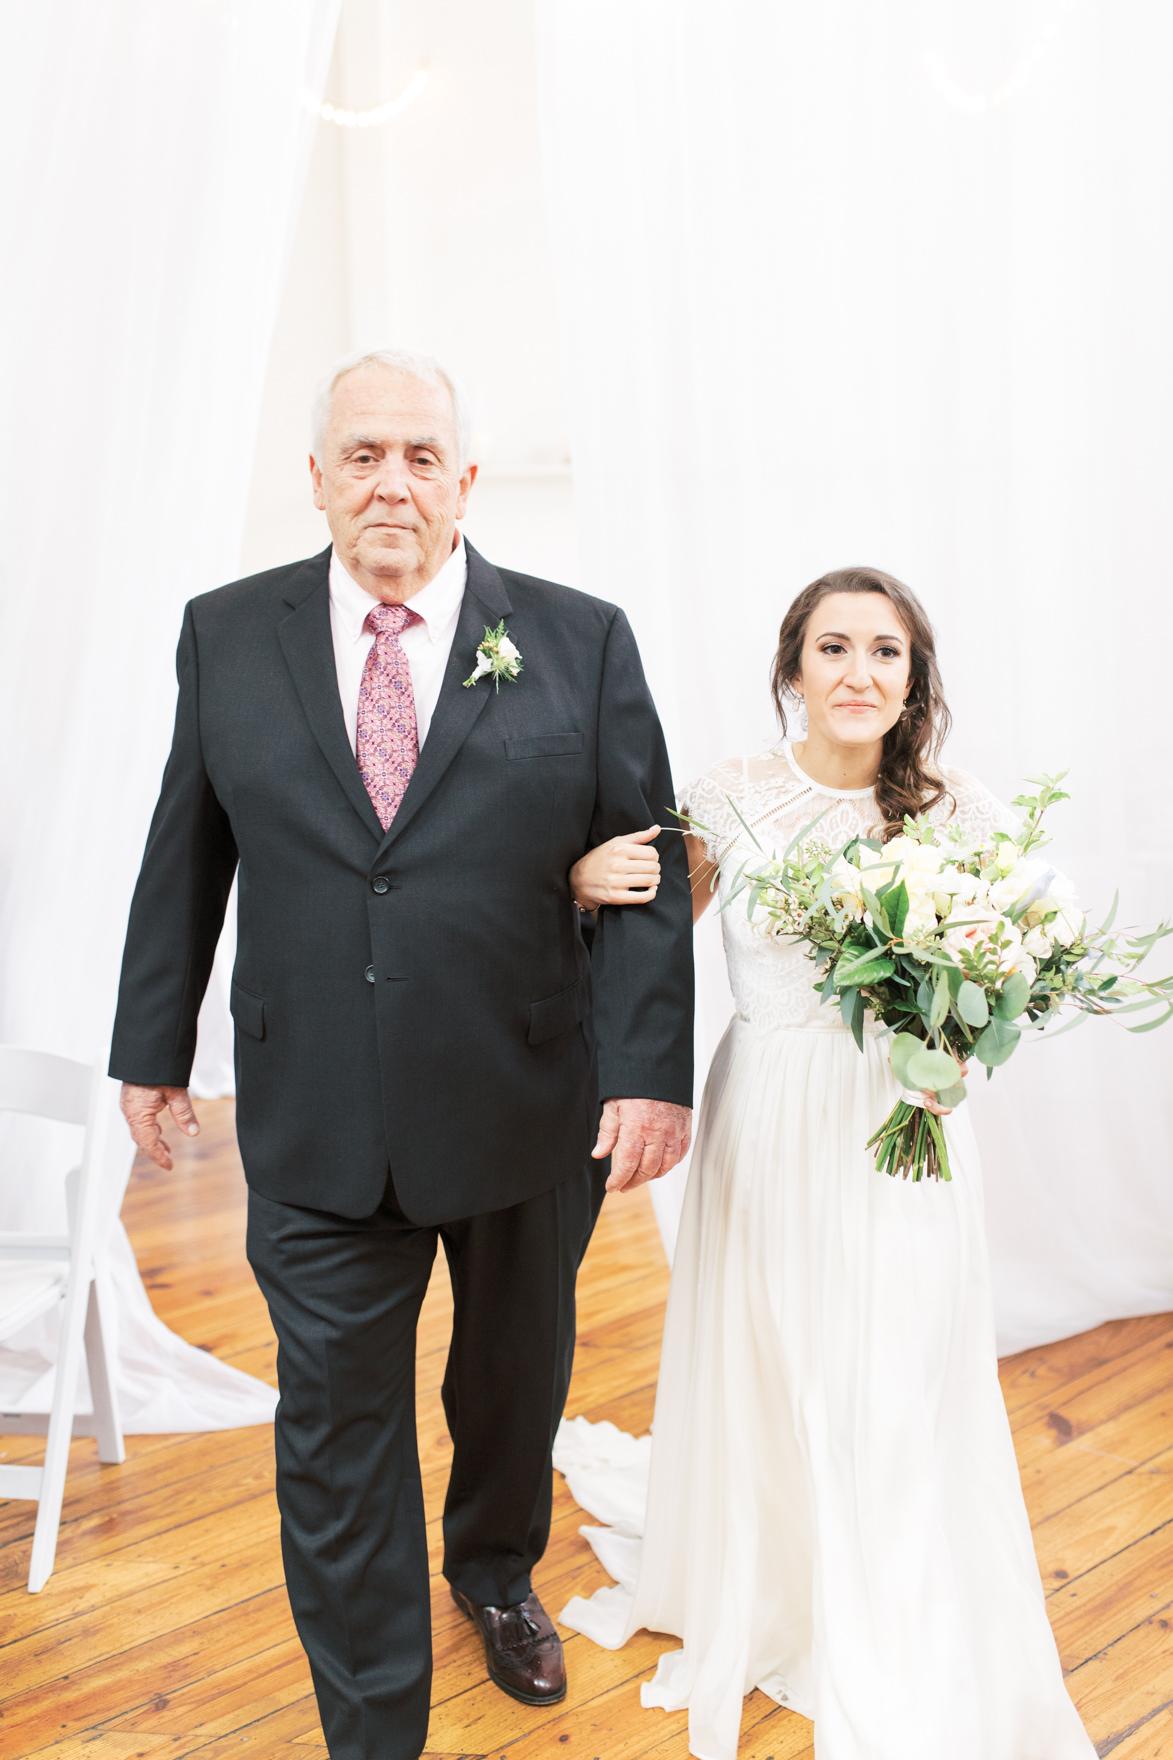 haley-richter-photography-keristin-wedding-same-sex-brides-philadelphia-photographer-modern-old-city-power-plant-productions-88.jpg